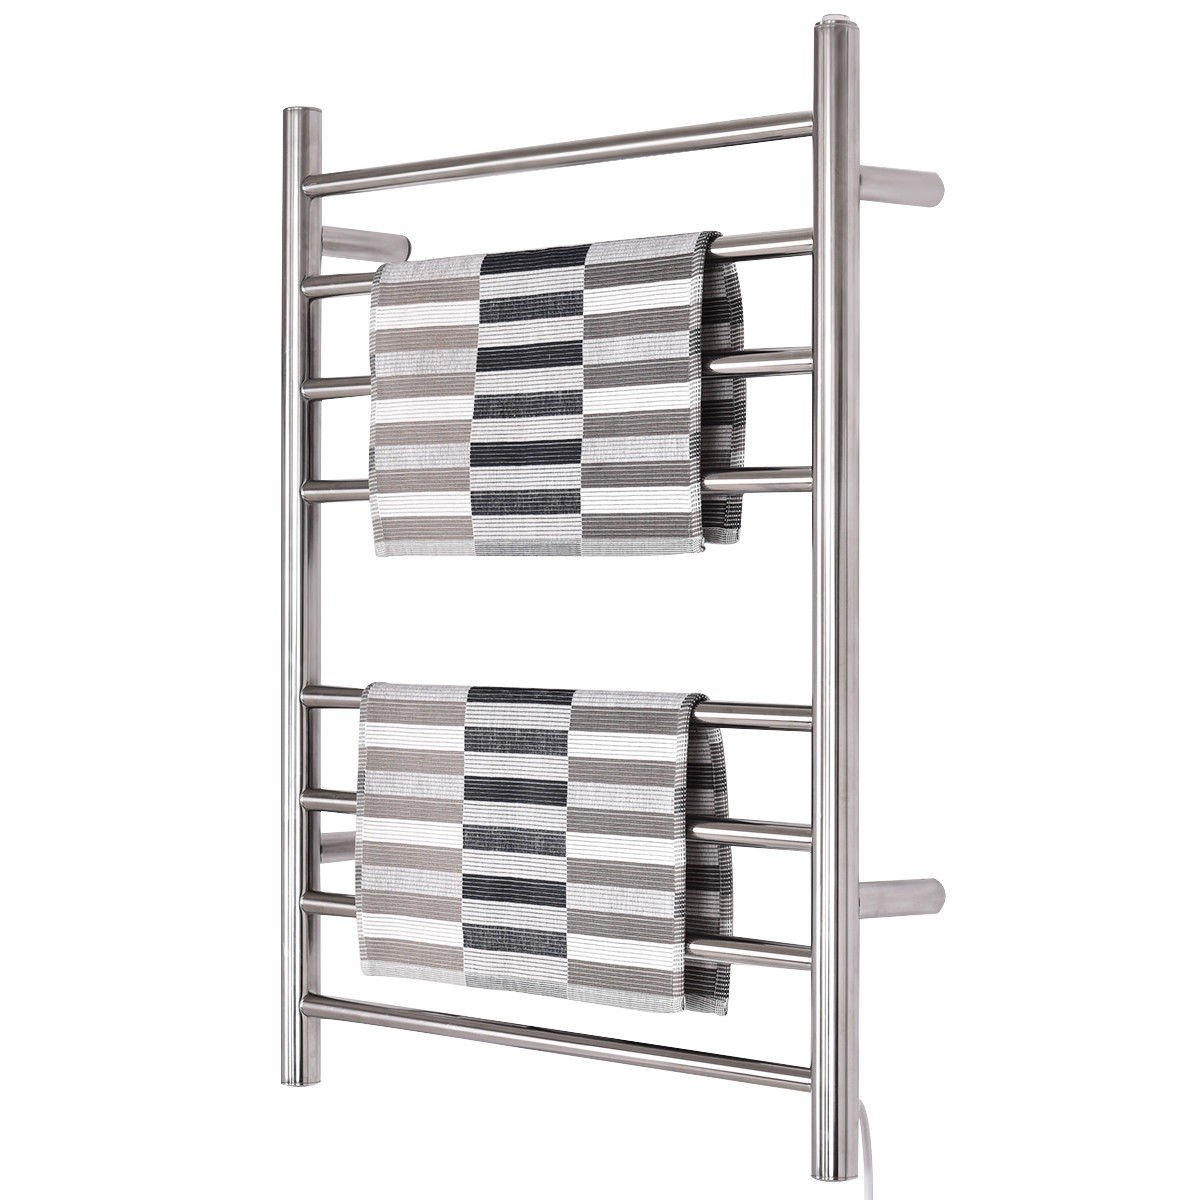 WATERJOY Towel Warmer and Drying Rack, 8 Bars Heated Stainless Steel Towel Rack, Wall-Mounted